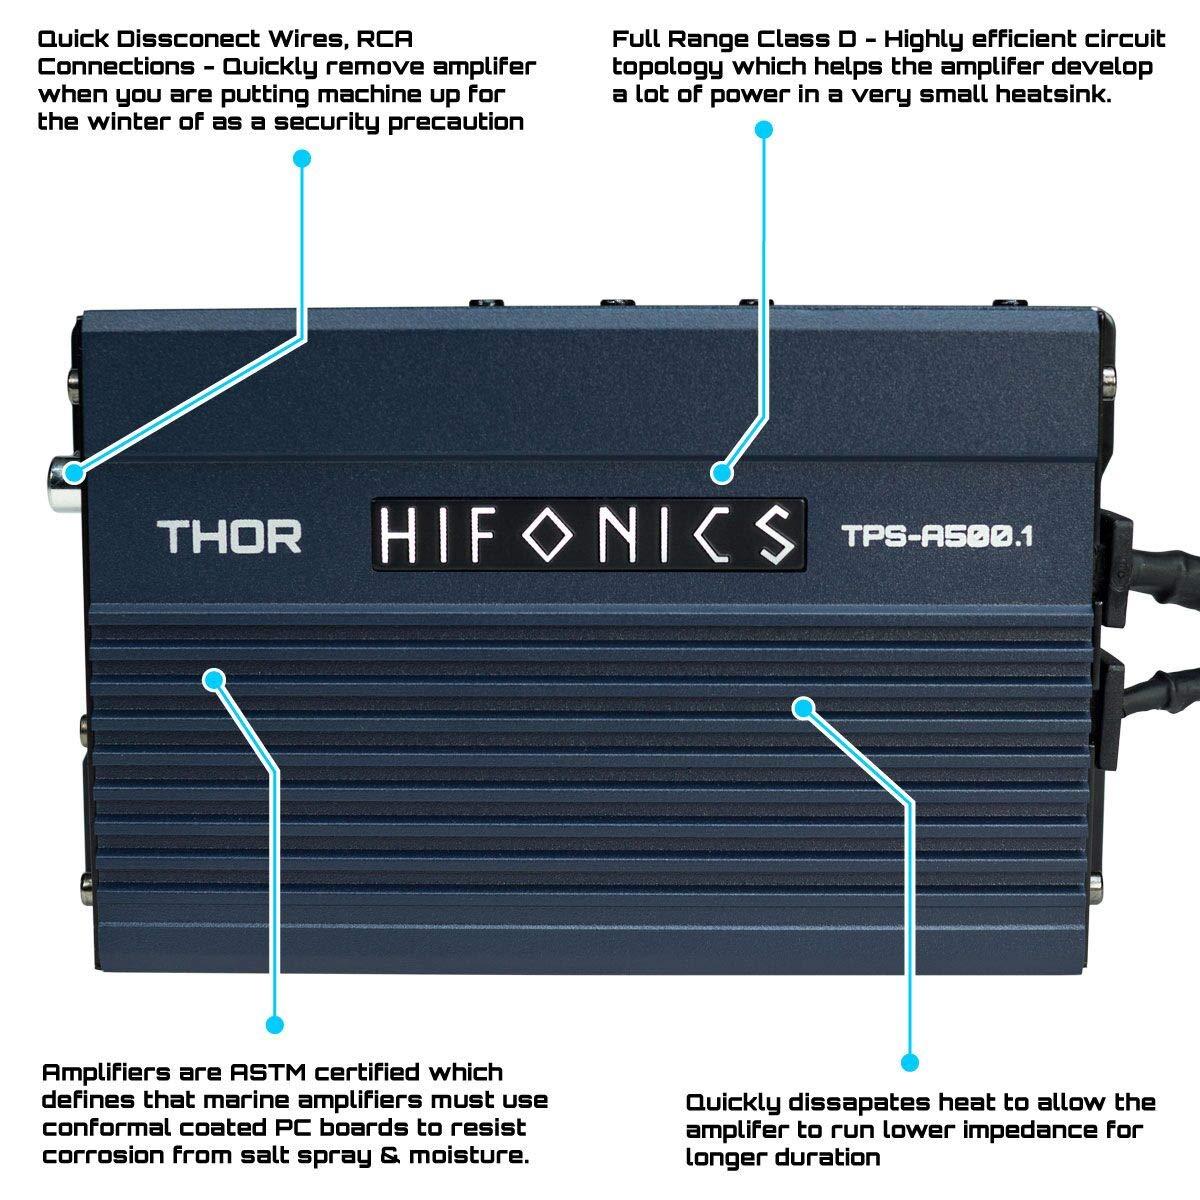 Hifonics TPS-A500.1 Compact 500 Watt Mono Powersports Amplifier